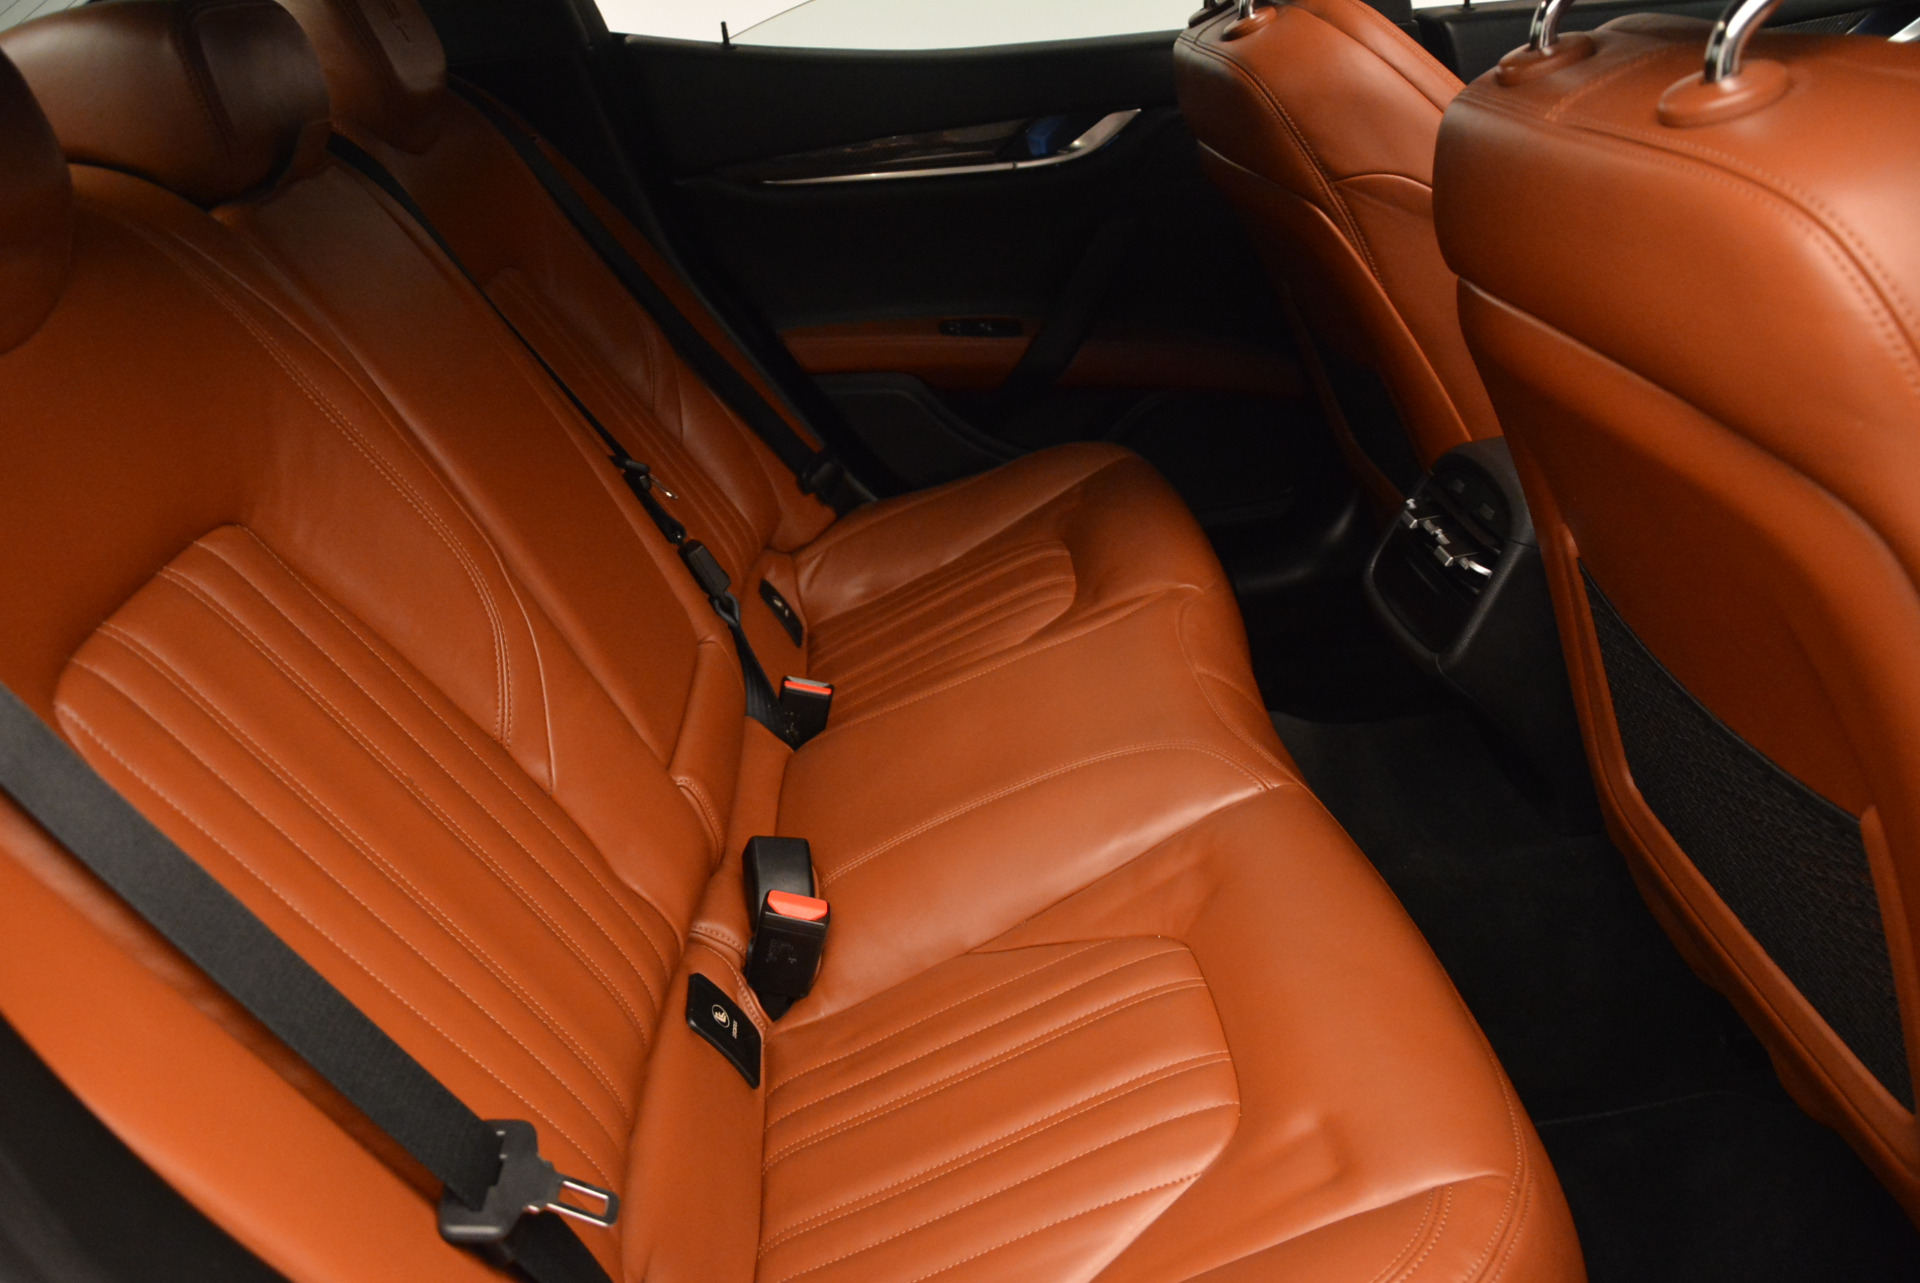 Used 2014 Maserati Ghibli S Q4 For Sale In Westport, CT 805_p24